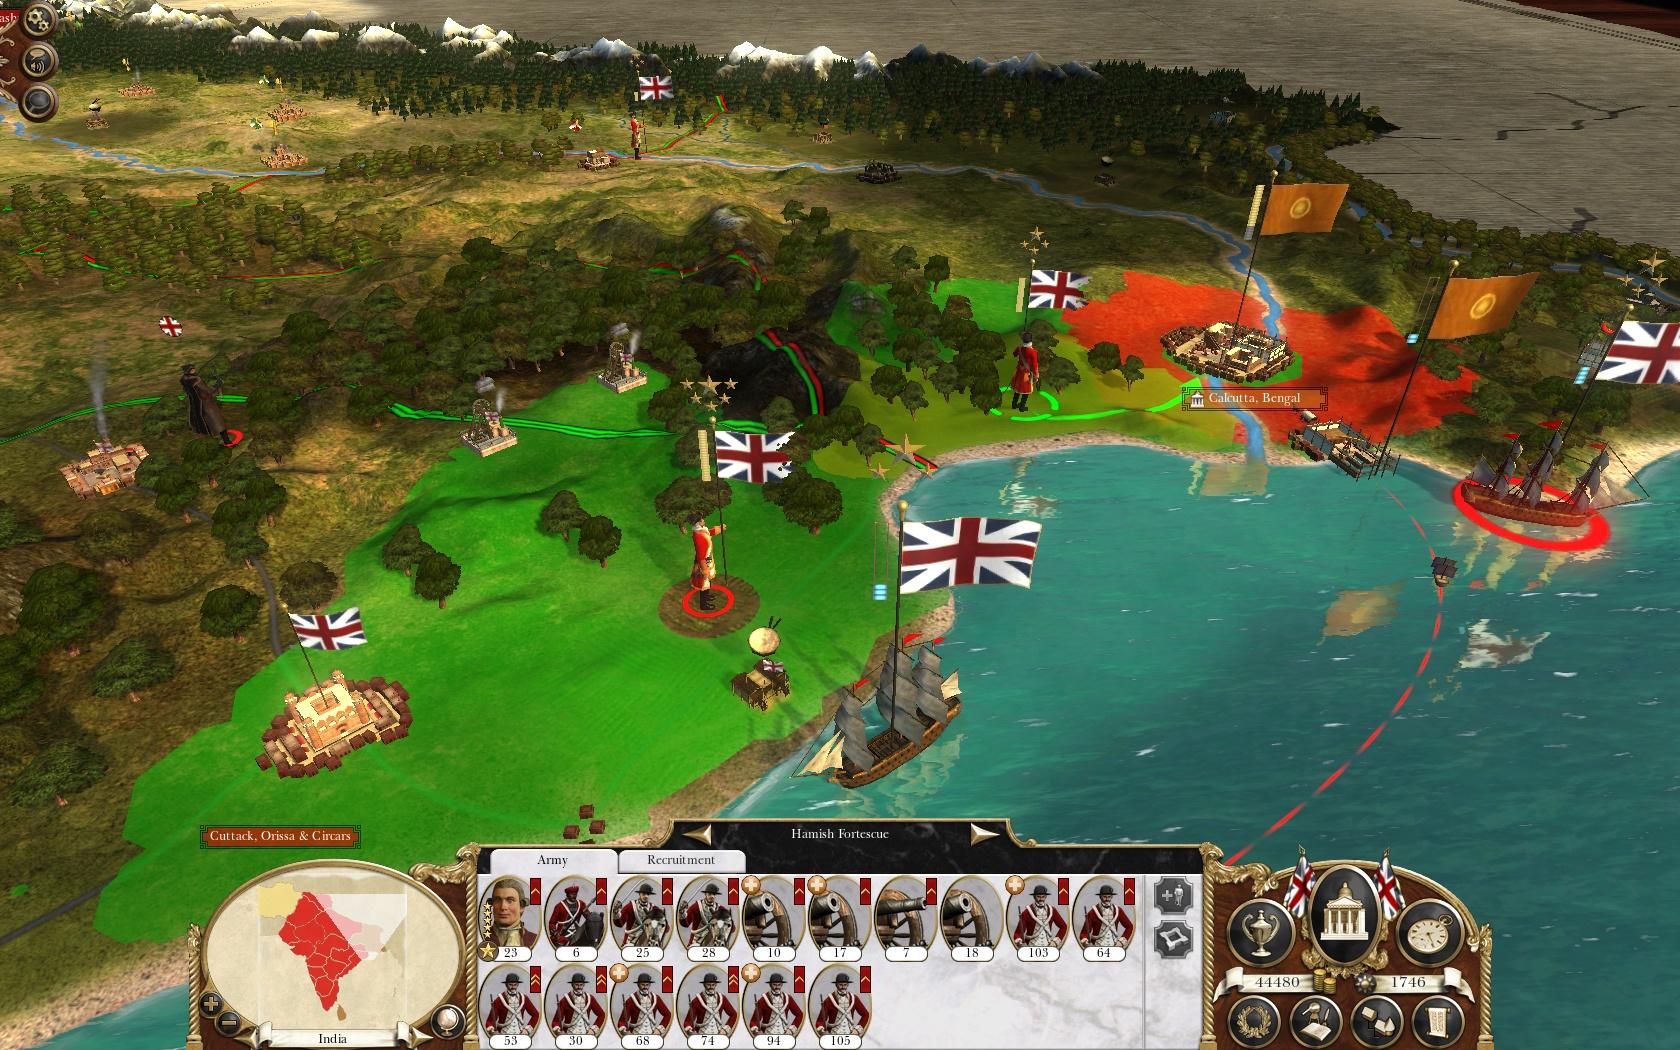 Empire total war - game kolonialisasi terbaik